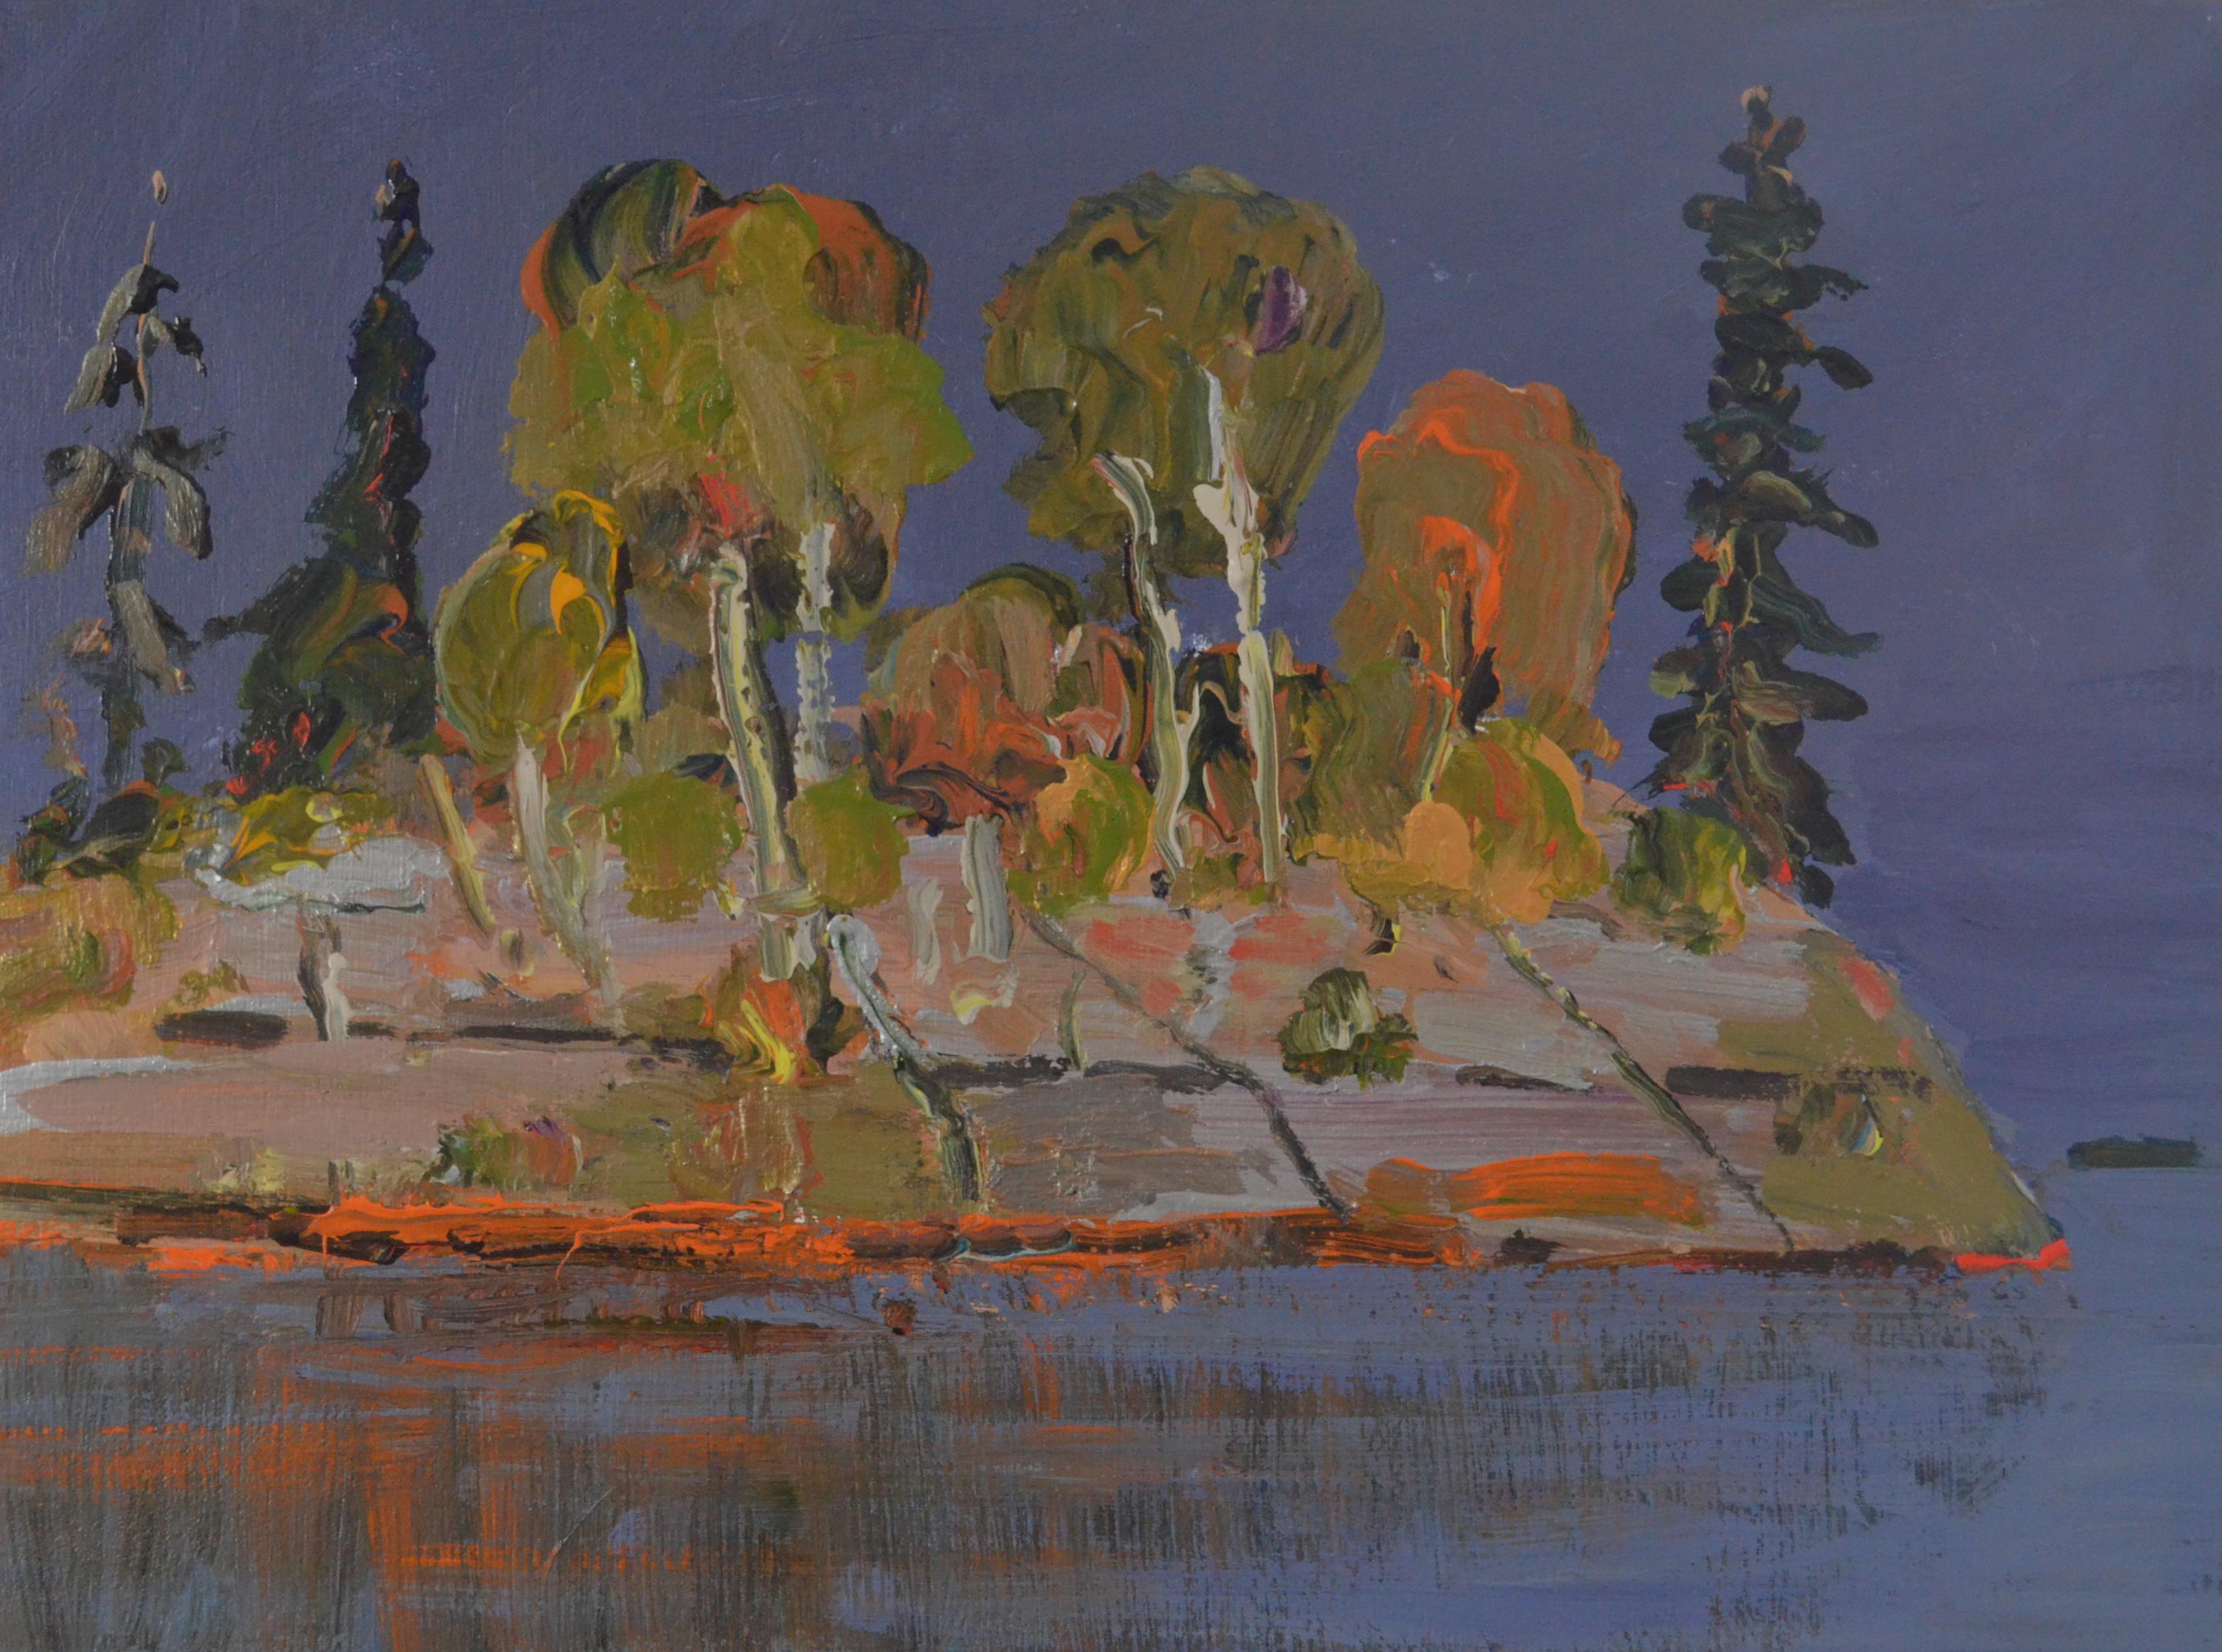 Little-Rock-Island-2014-acrylic-on-panel-12in-x-16in-